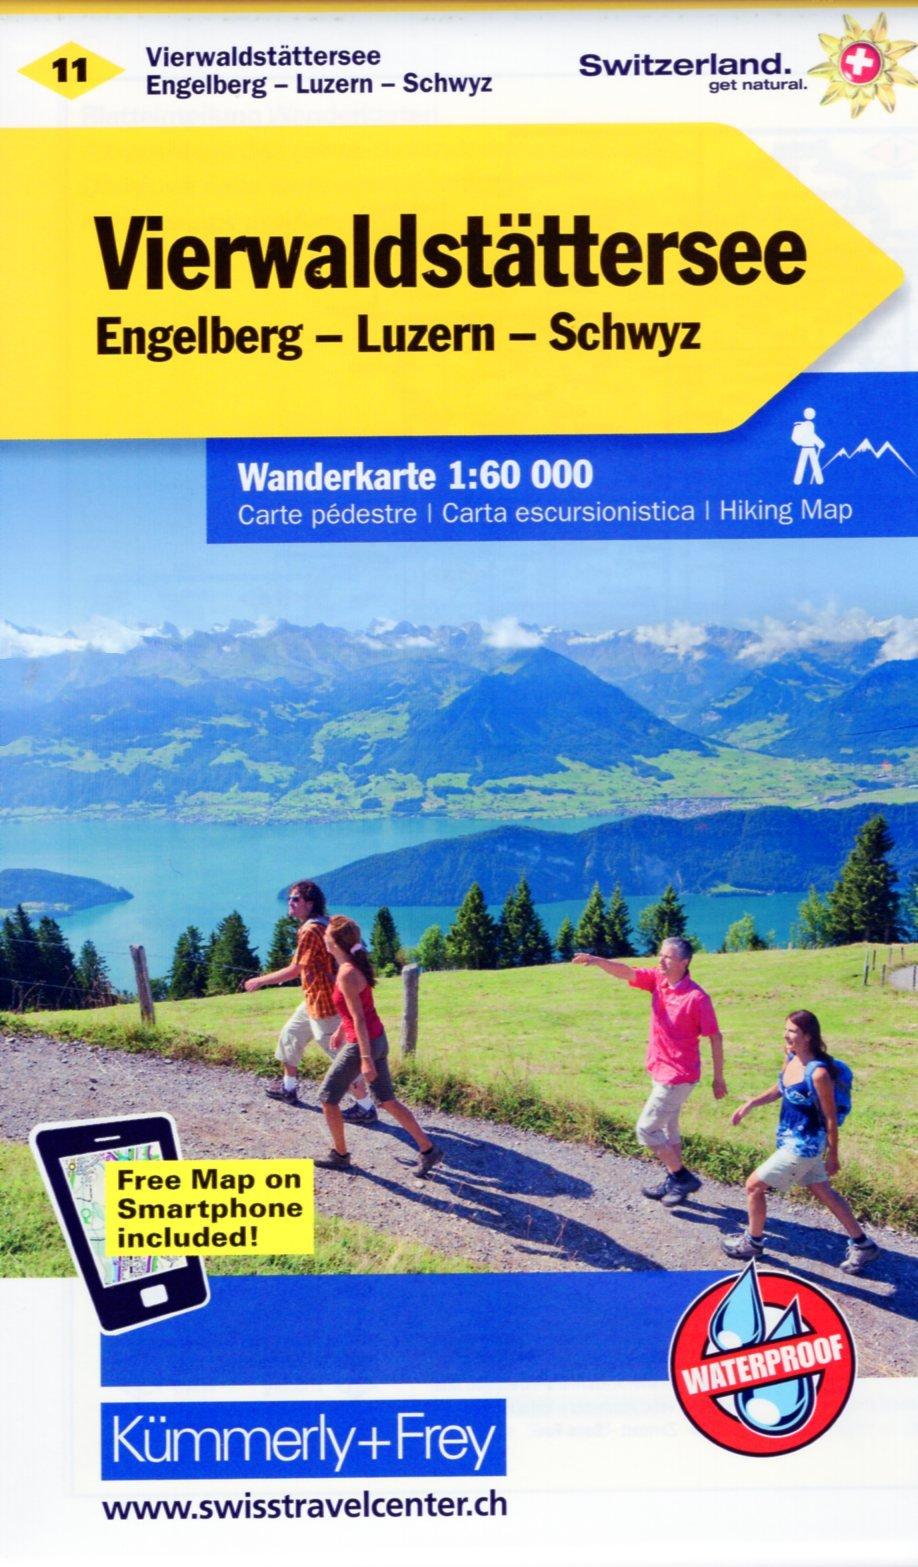 KFW-11  Vierwaldstättersee   wandelkaart / overzichtskaart 9783259022115  Kümmerly & Frey Wandelkaarten Zwitserland  Wandelkaarten Noordoost- en Centraal Zwitserland